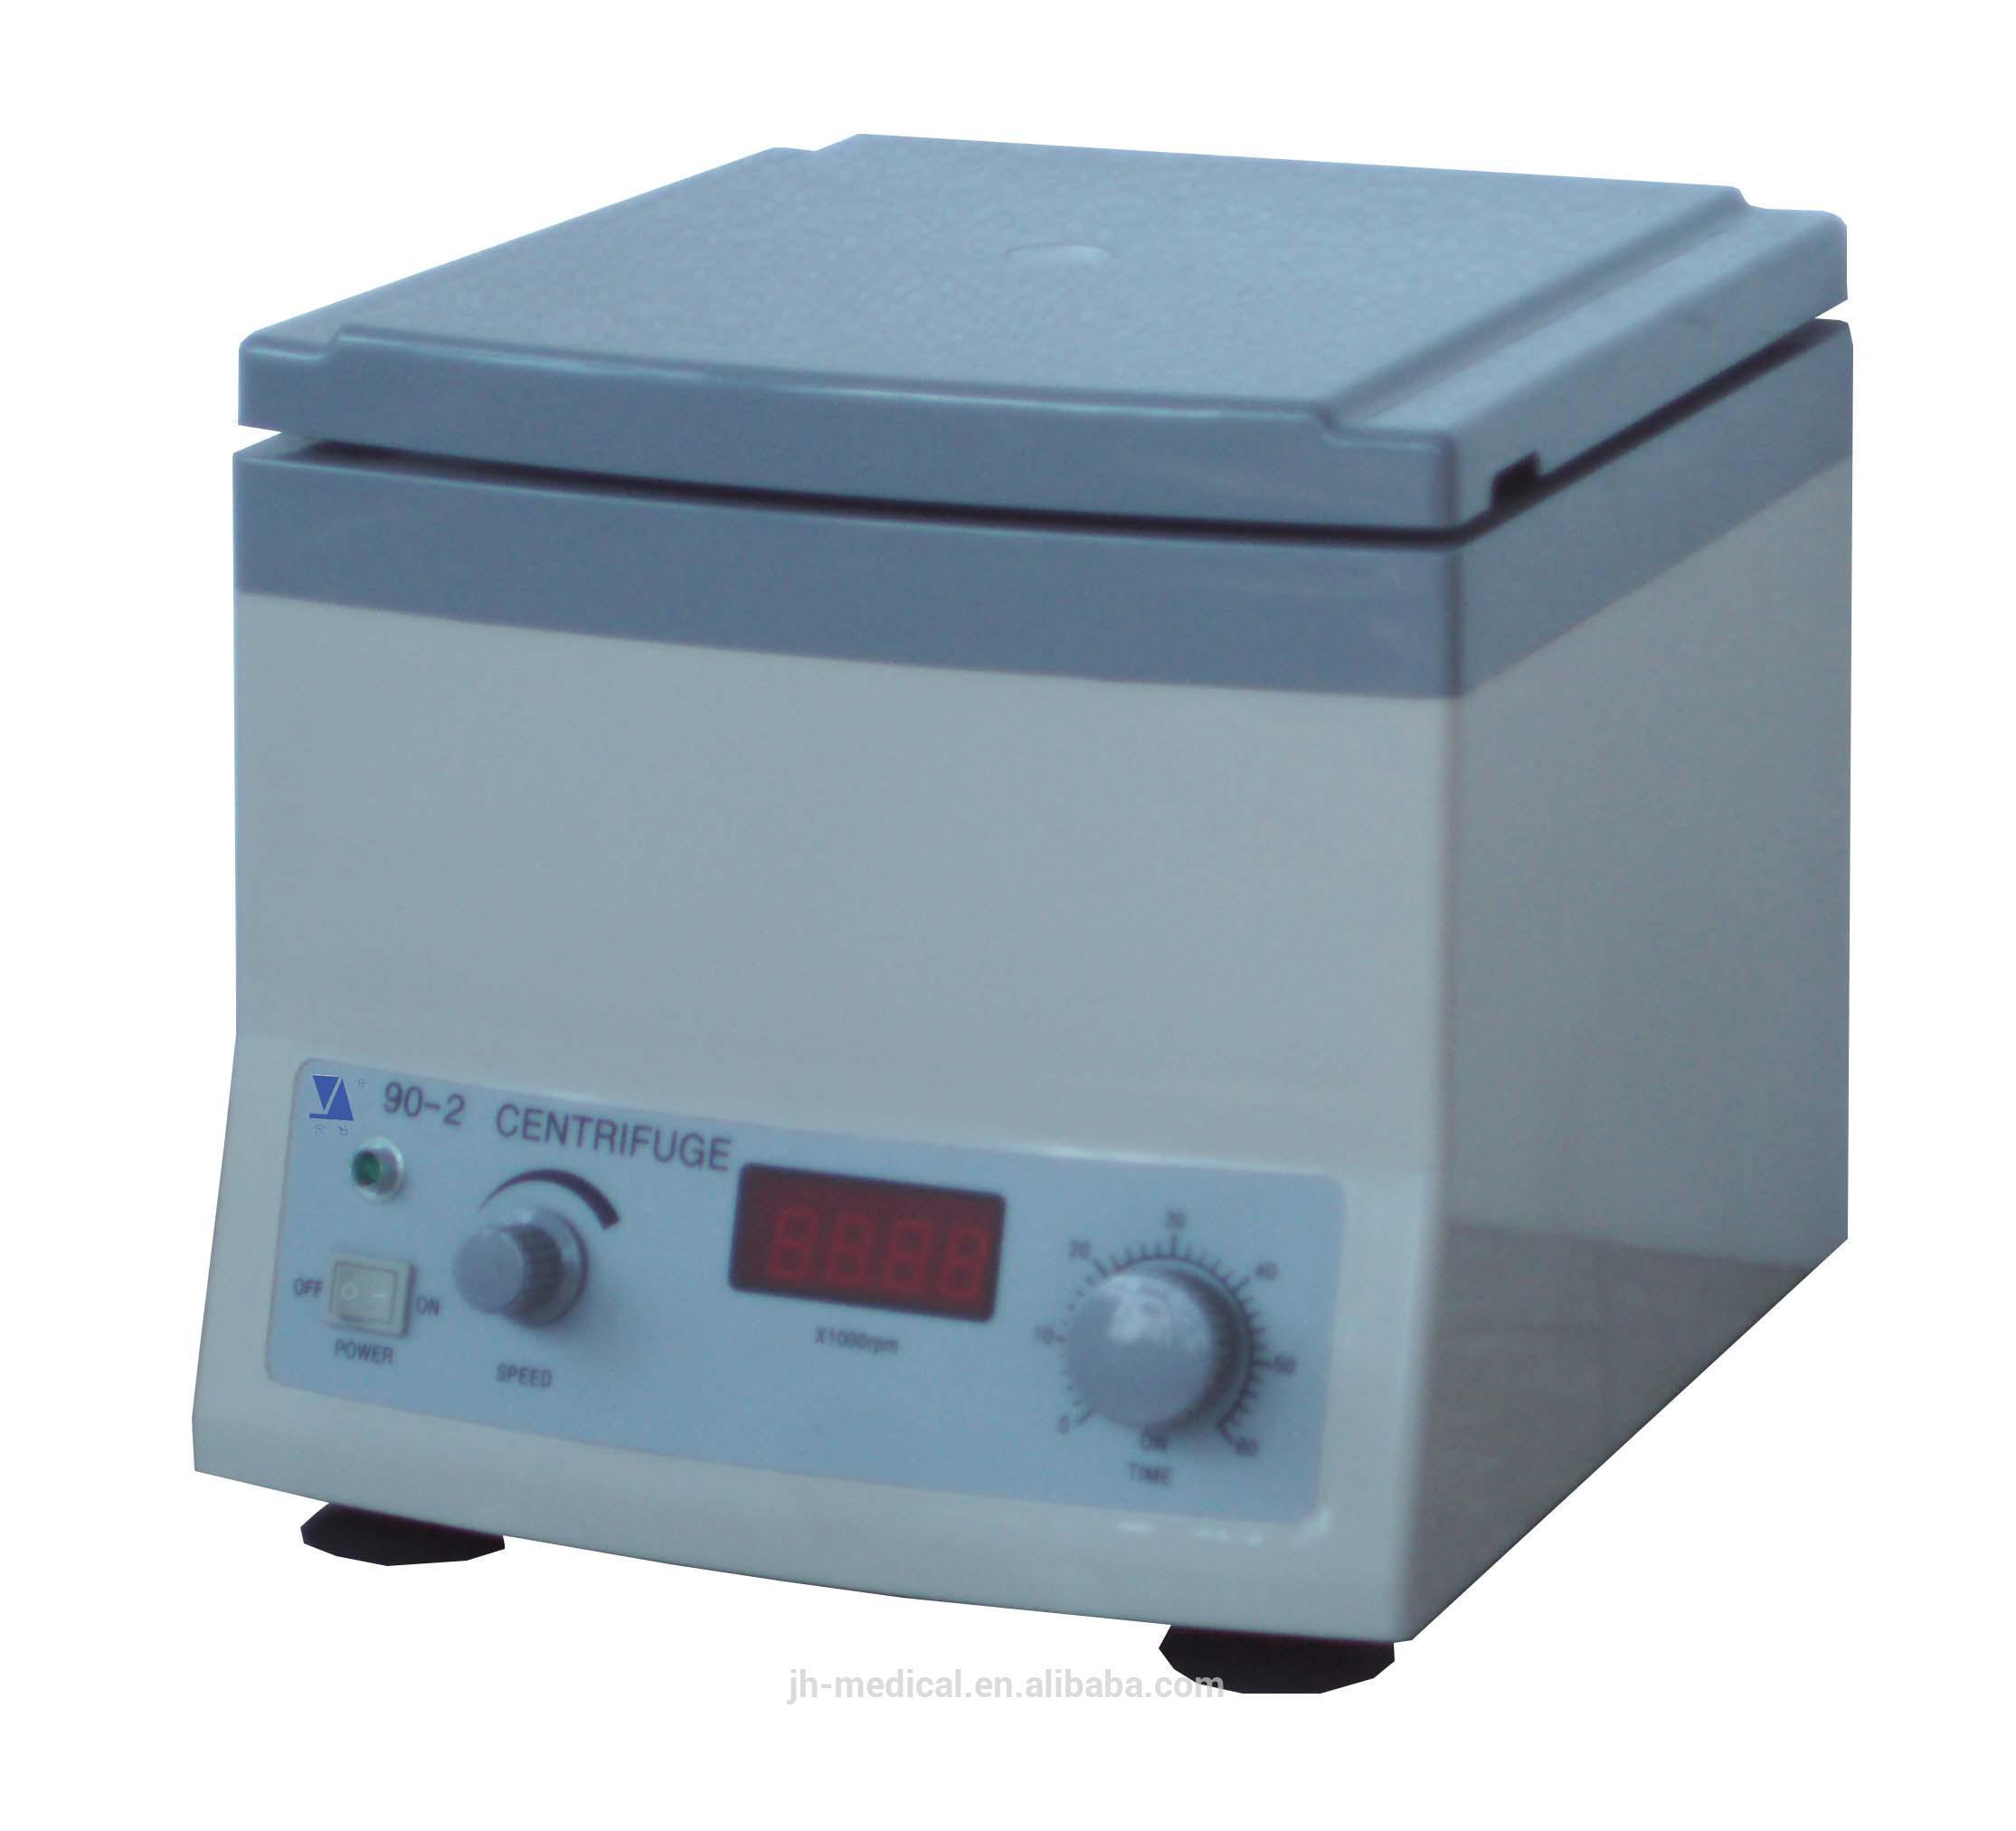 Centrifuge Device